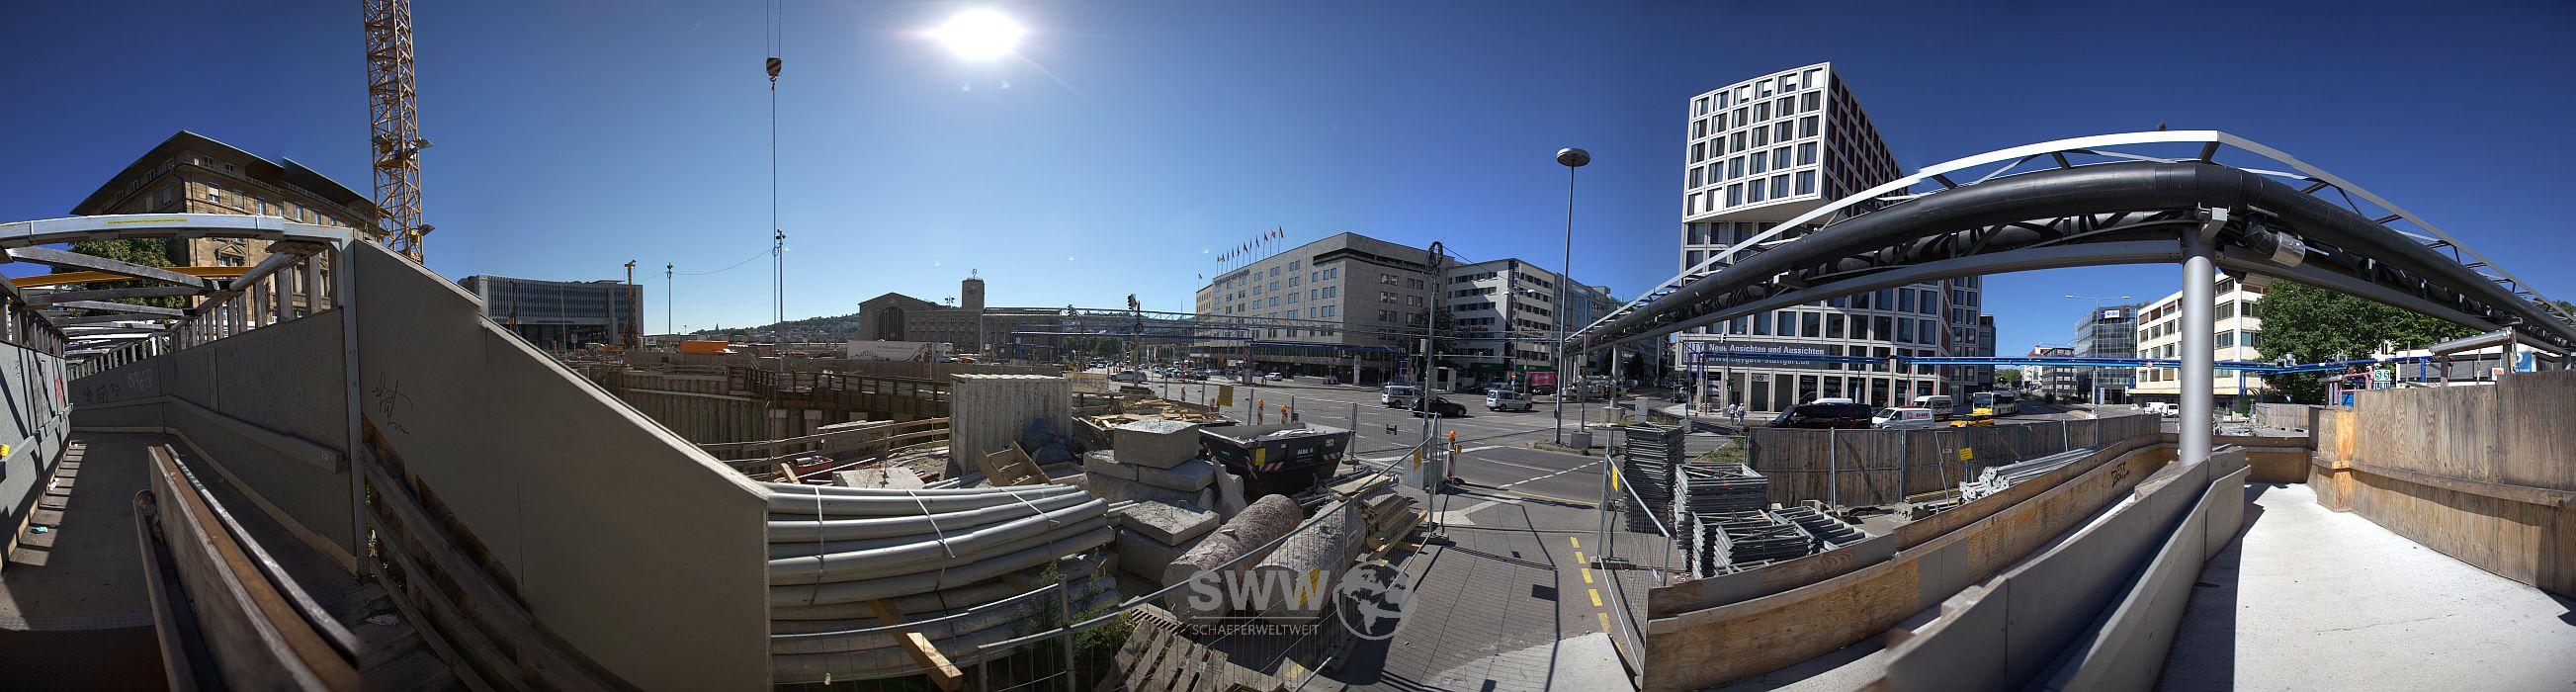 "Panorama ""H7, U12 und Citygate"""